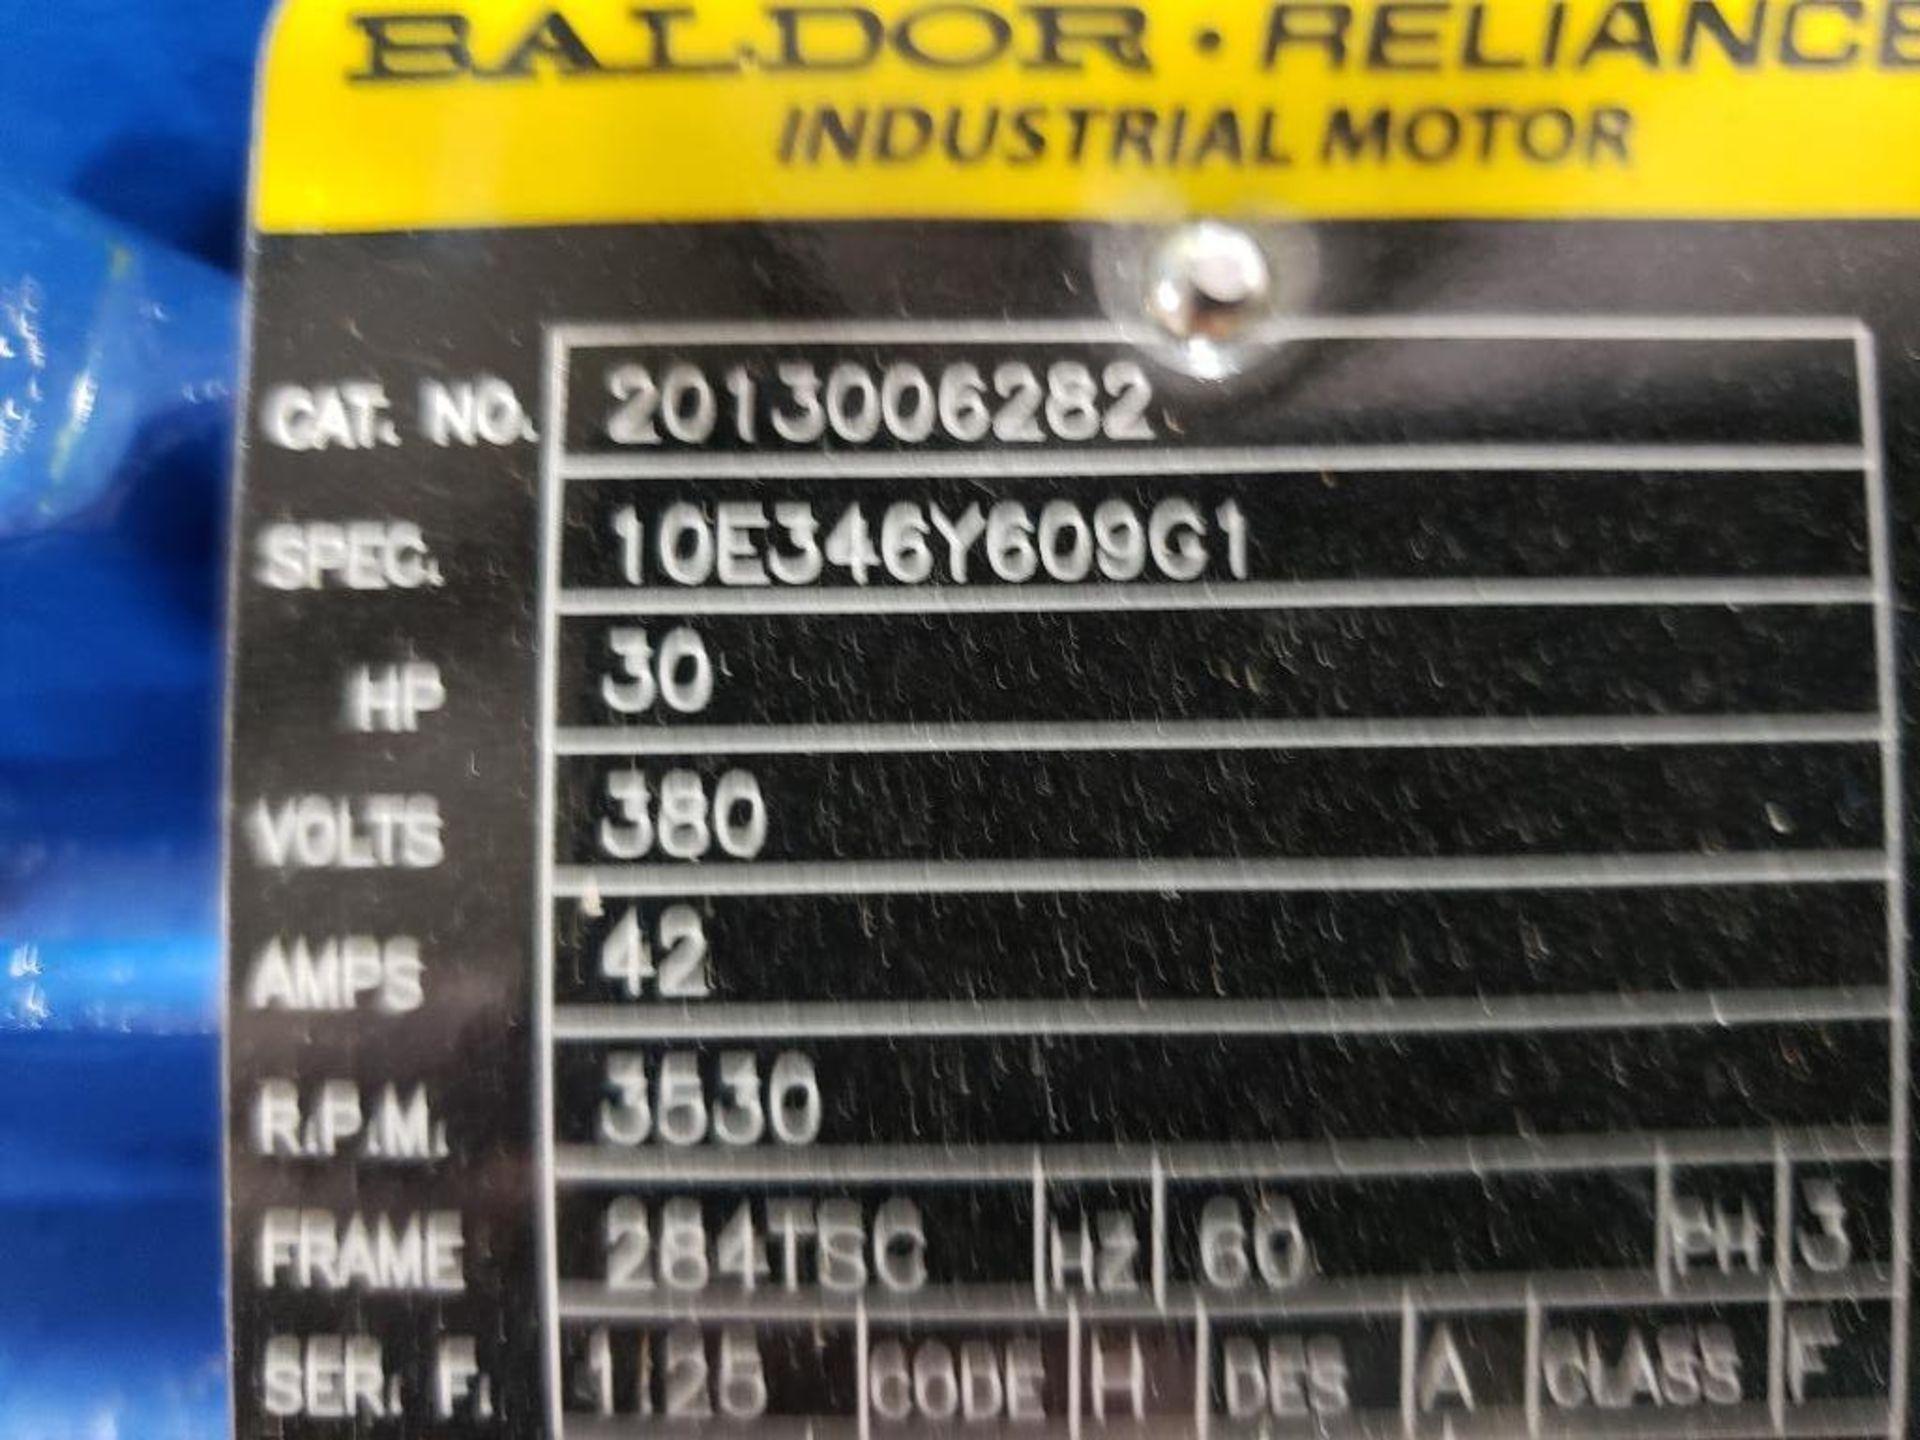 30HP Baldor Reliance 3PH motor. 2013006282. 380V, 3530RPM, 284TSC-Frame. - Image 4 of 8